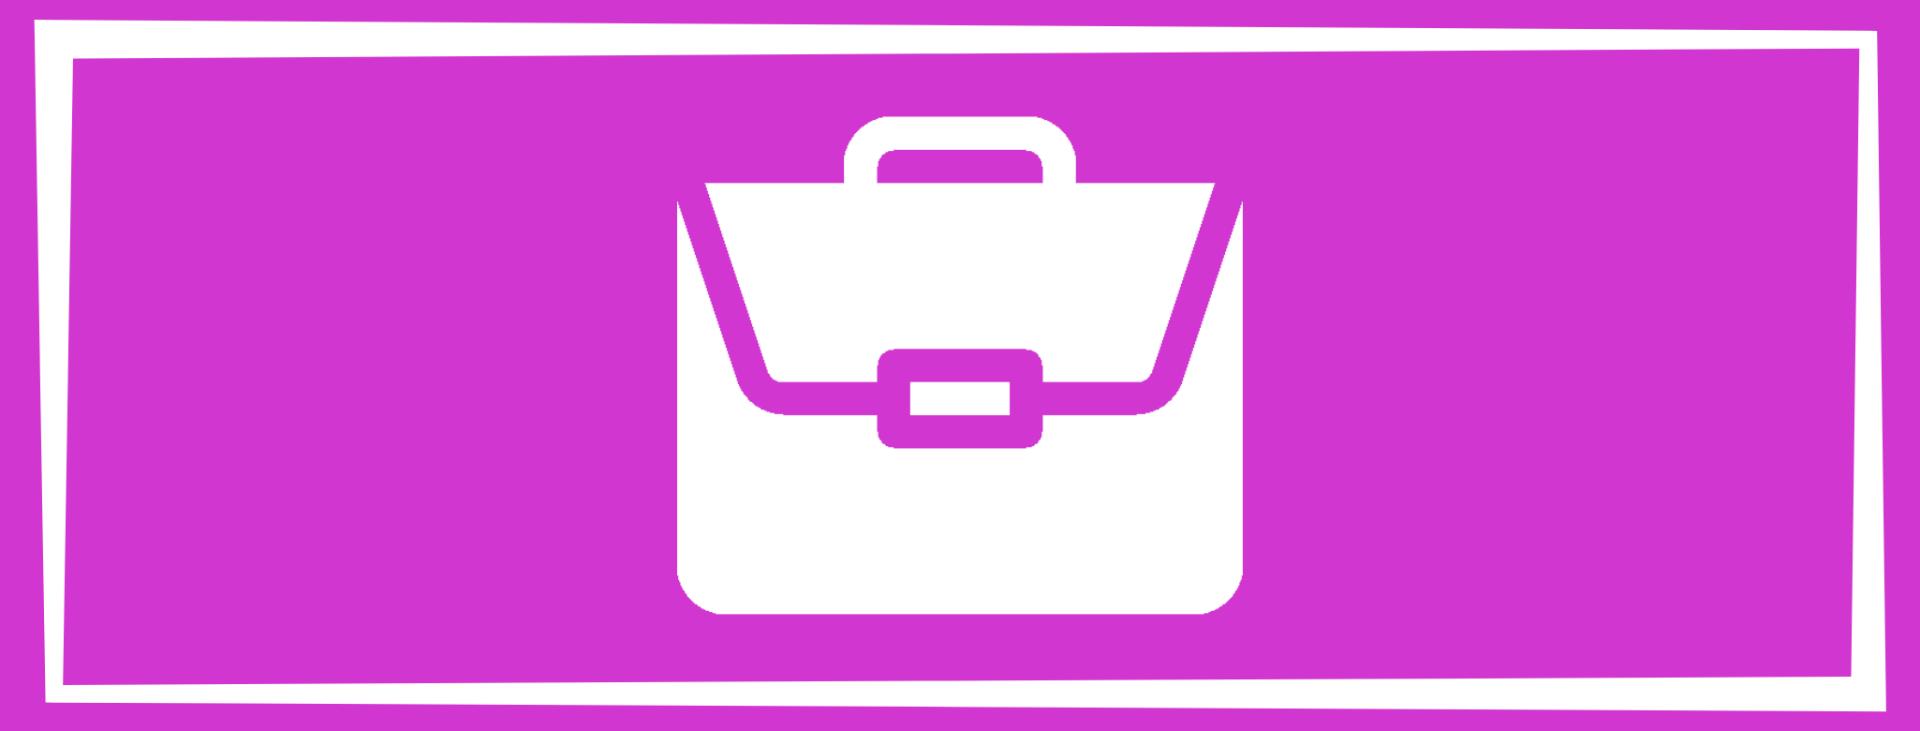 magenta color and briefcase to represent career wellness